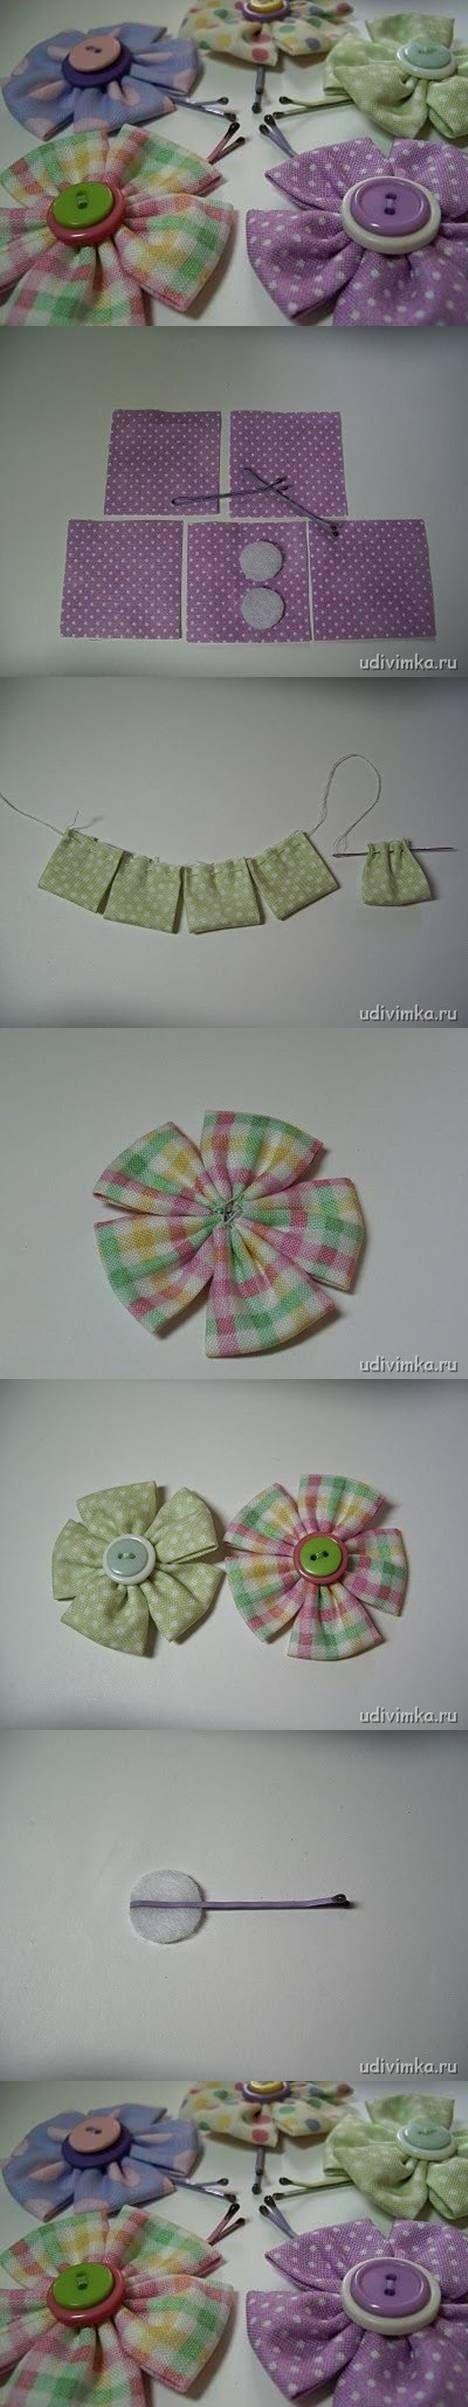 DIY Cute Fabric Flower Hairpin DIY Cute Fabric Flower Hairpin by diyforever